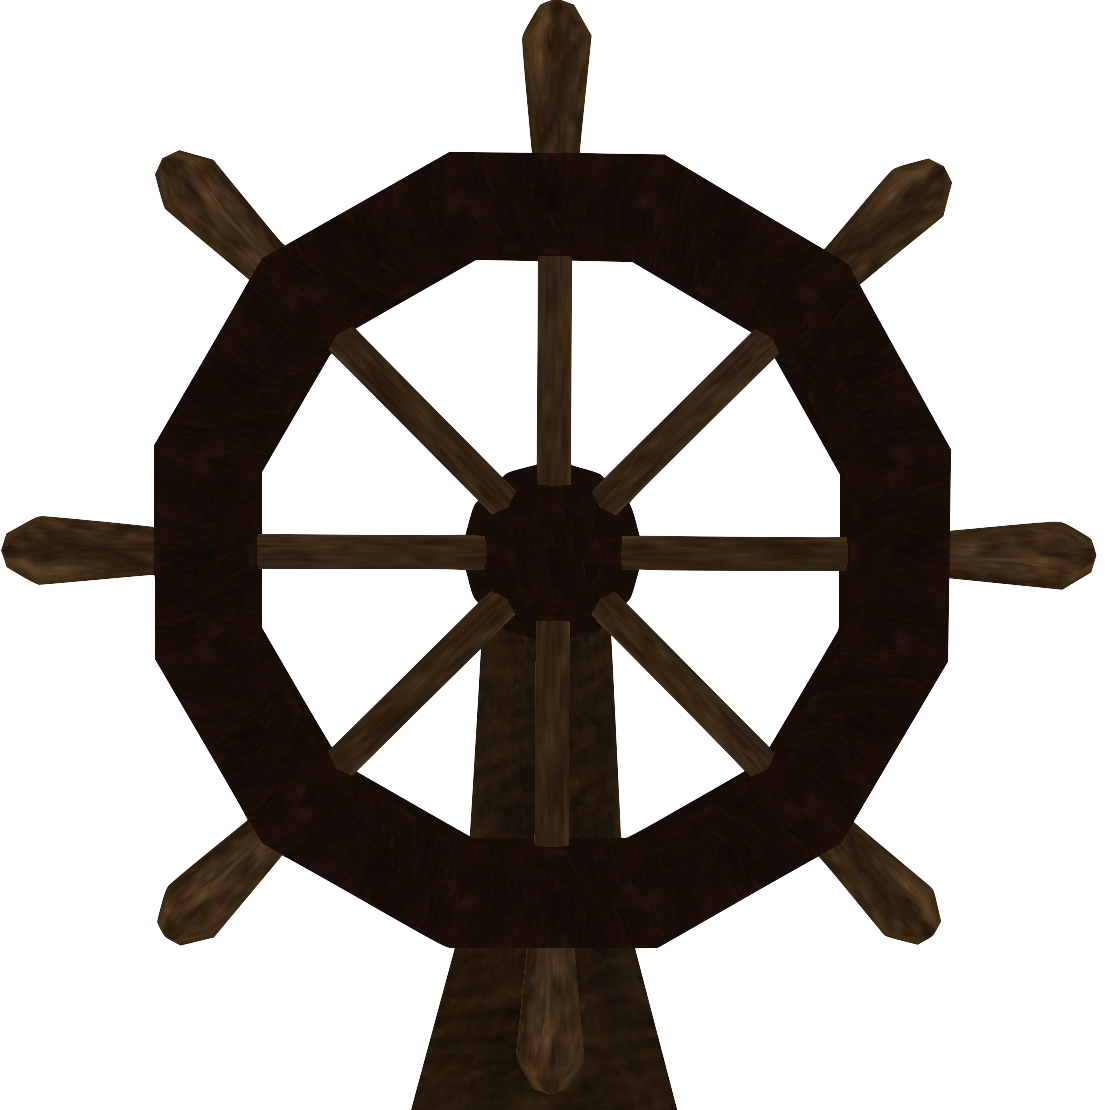 Pirate Ship Steering Wheel Template Drawing Free Image